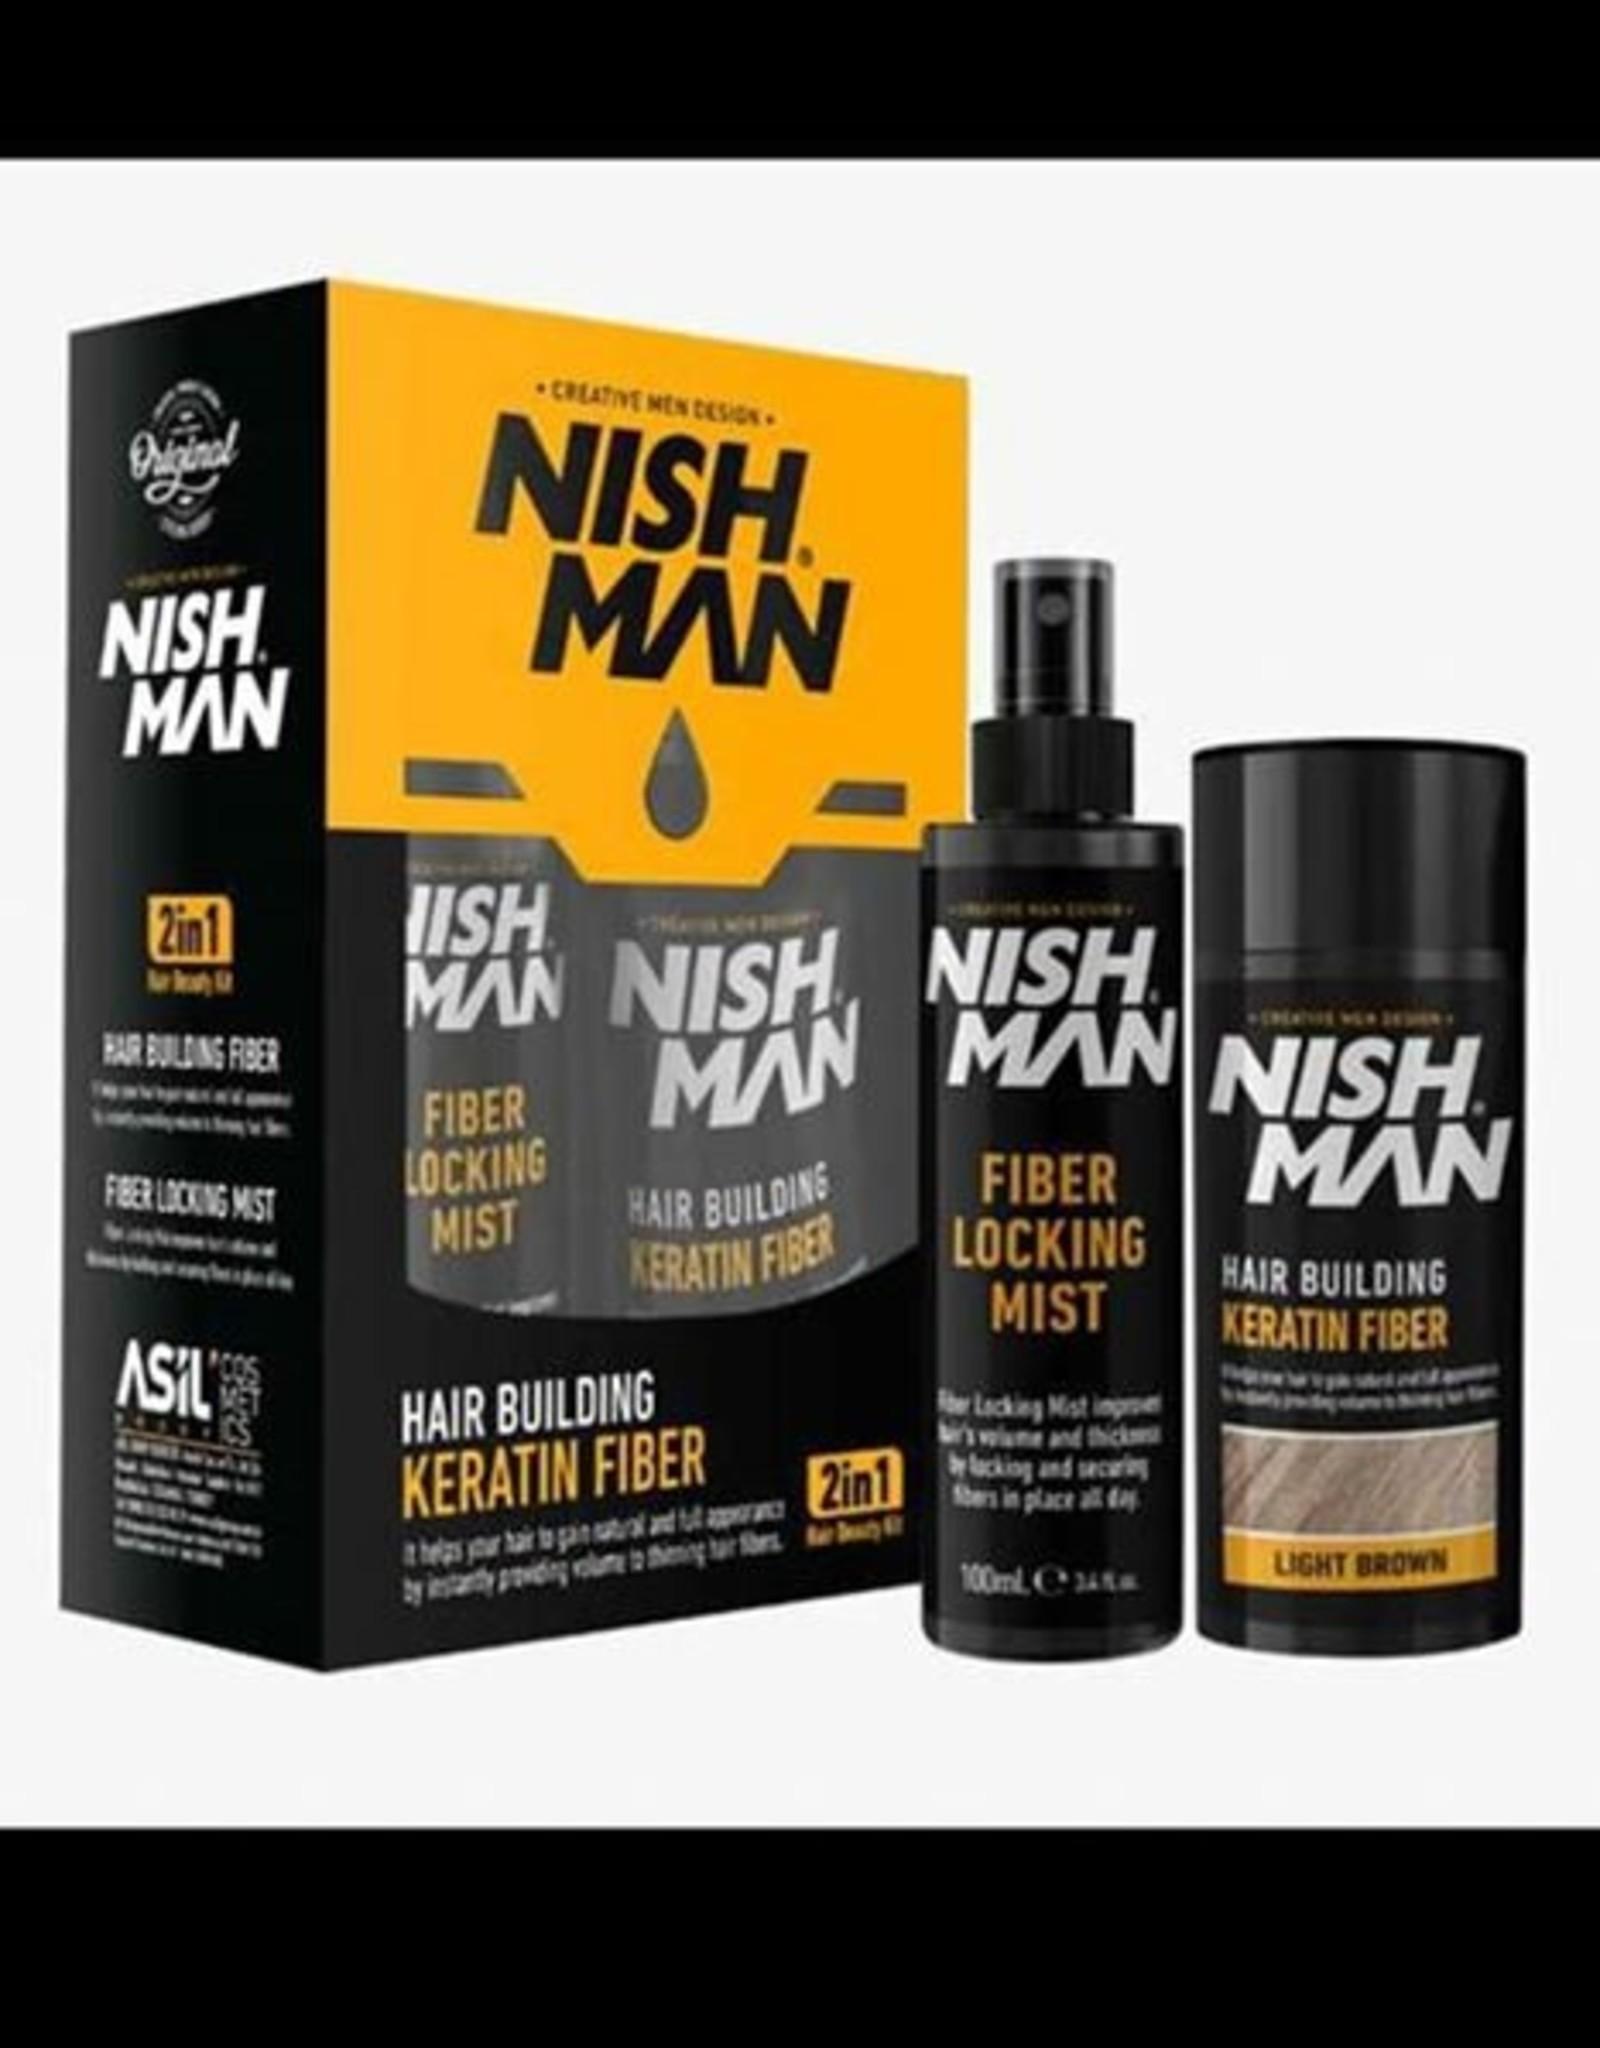 Nishman Hair Building Fiber + Mist Spray